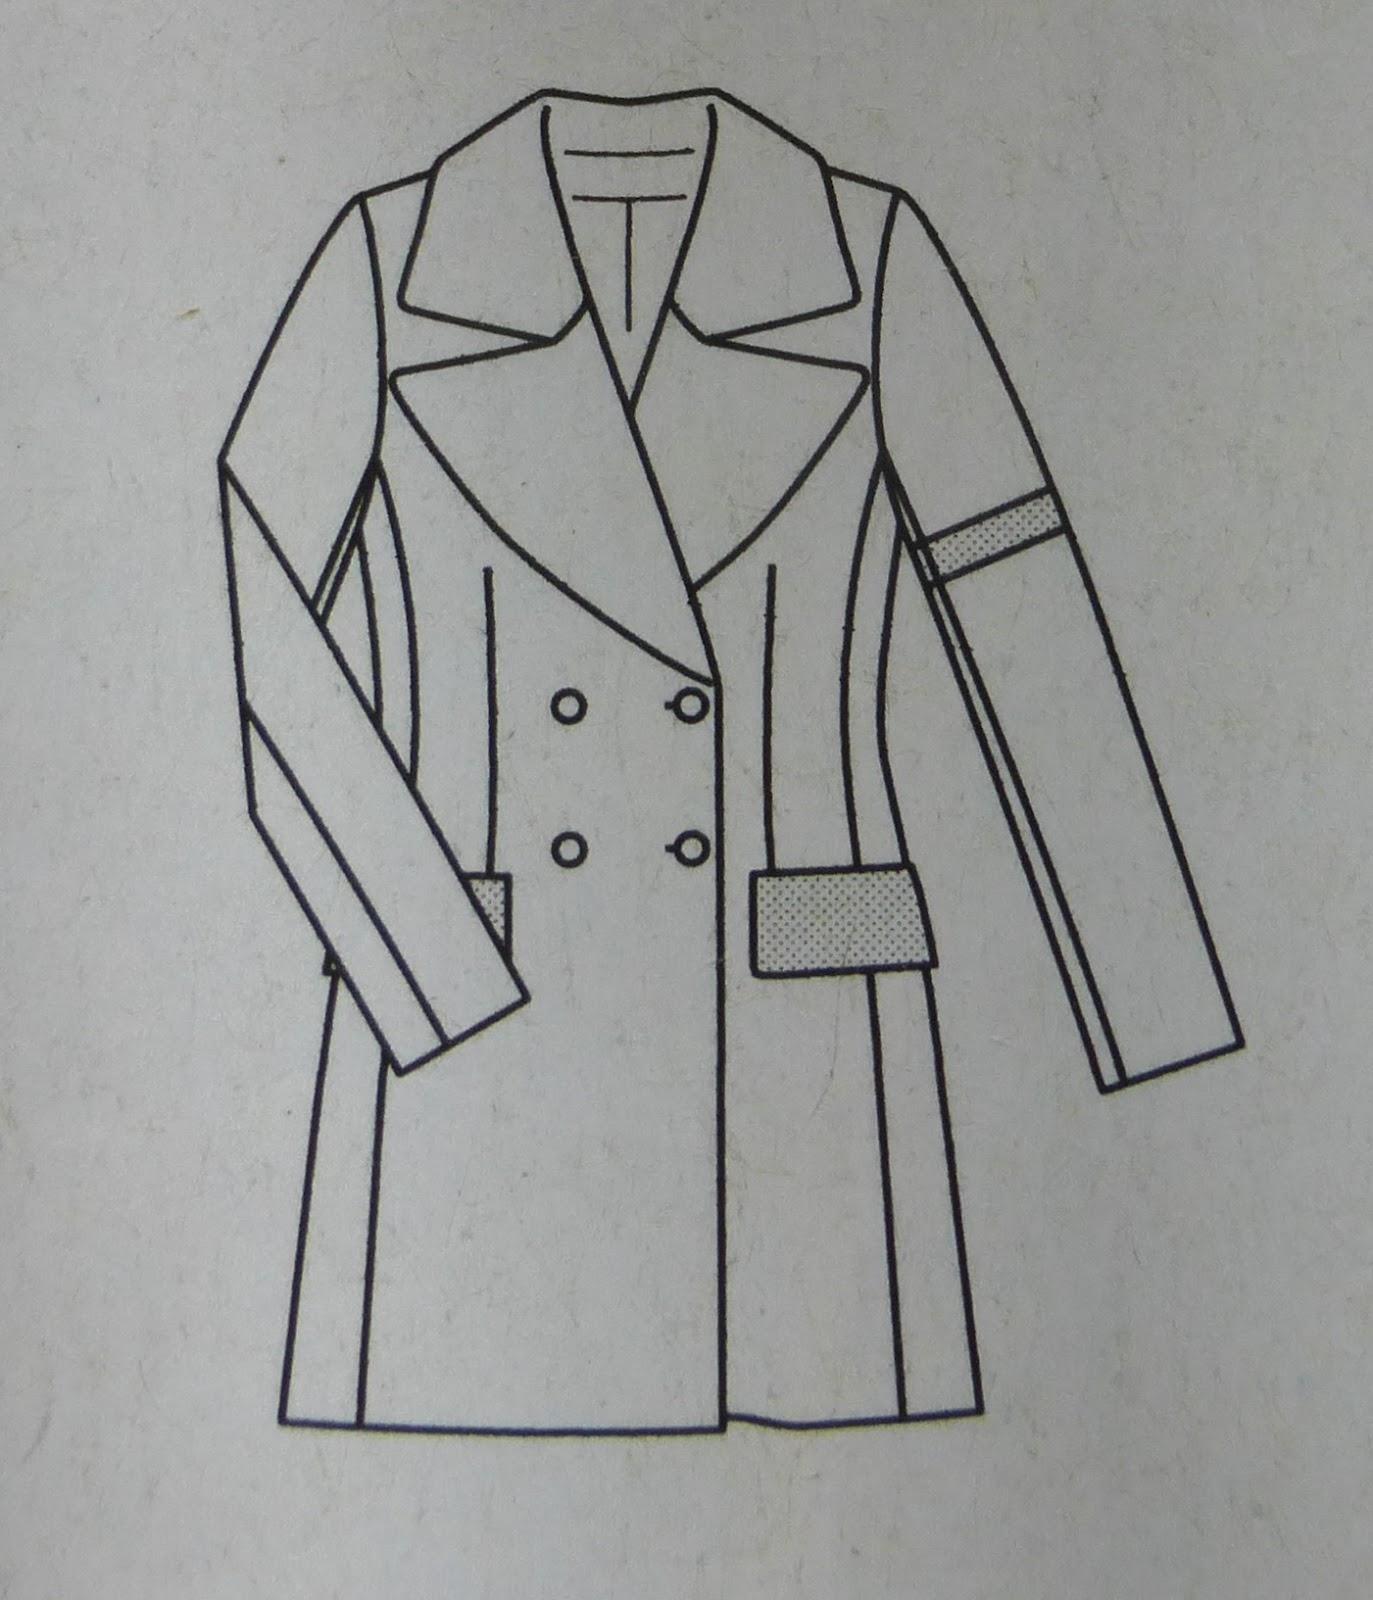 Kleidermanie: Winterjacken-Sewalong 2015: Cabanjacke oder Mantel?